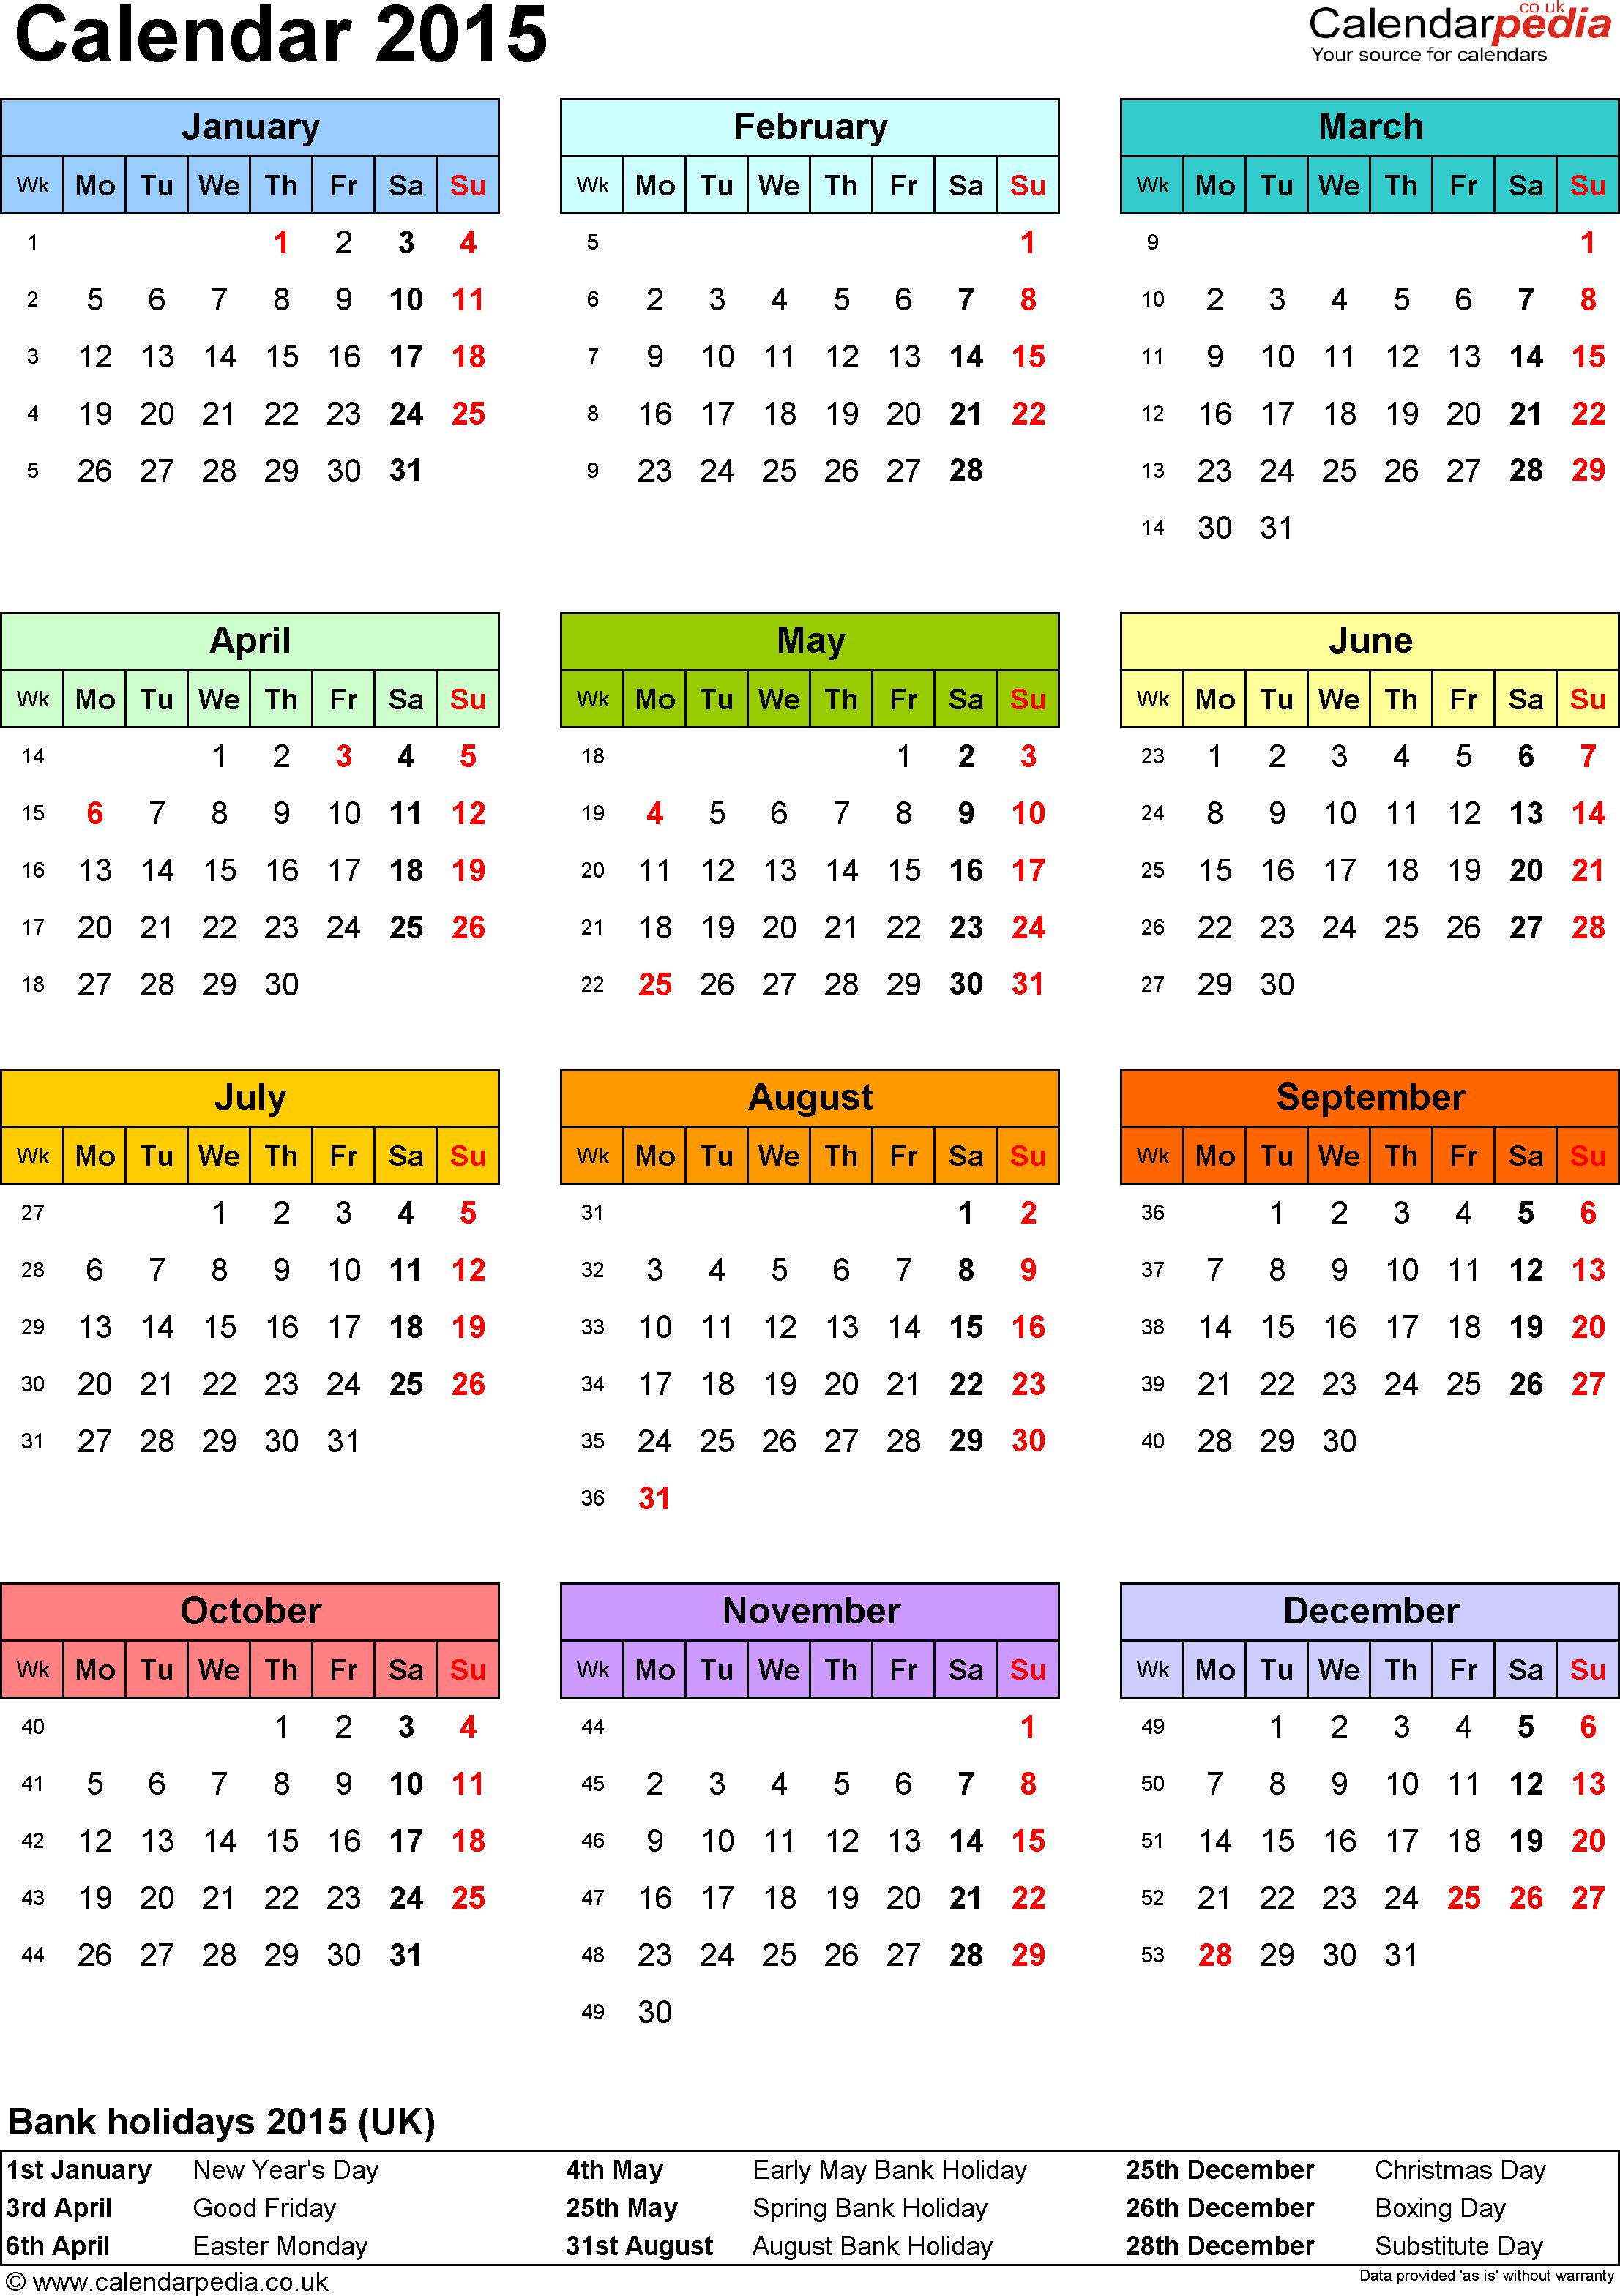 Calendar 2015 (Uk) - 16 Free Printable Pdf Templates - Free Printable Diary 2015